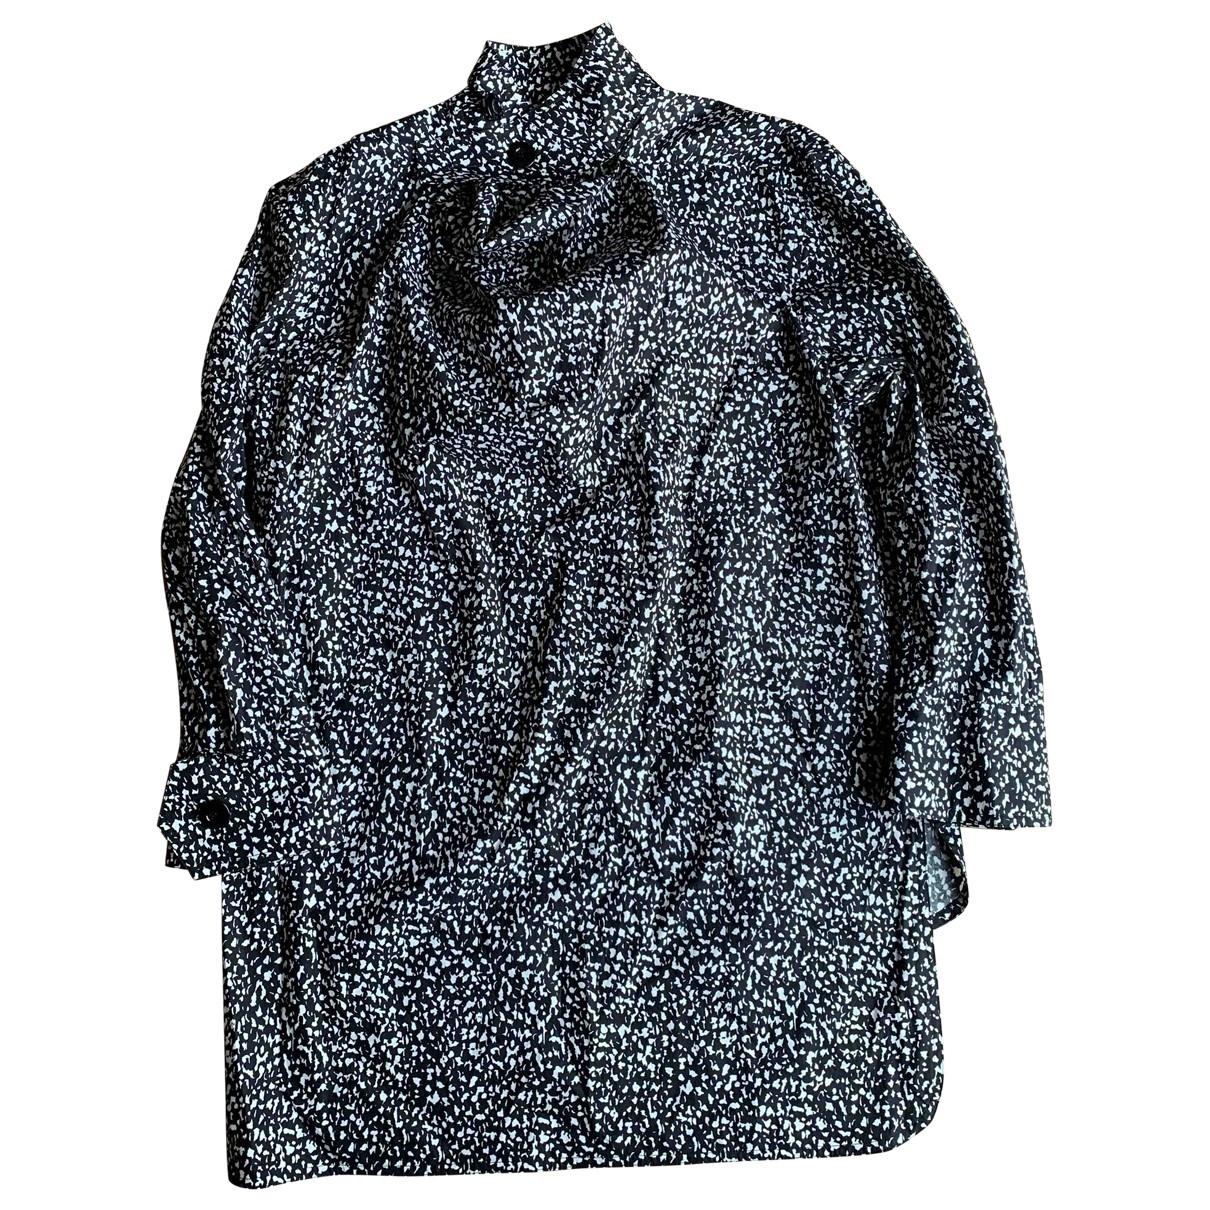 Marni \N Multicolour Cotton dress for Women 38 IT